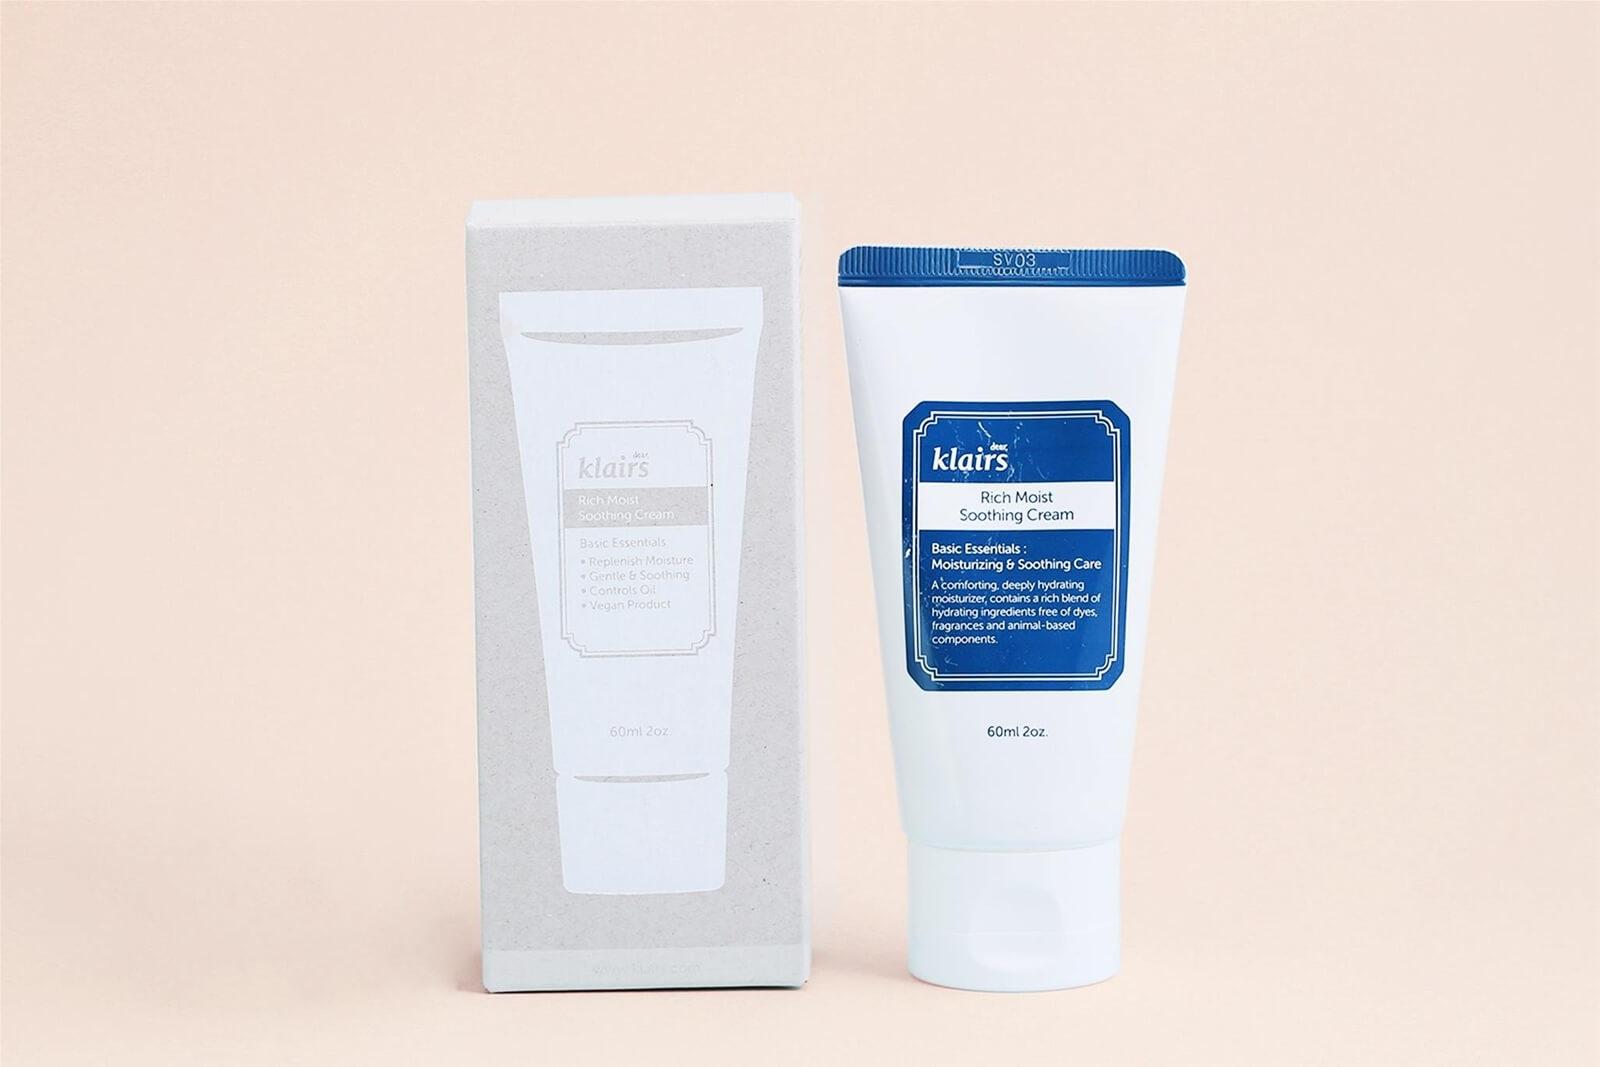 kem-duong-klairs-rich-moist-soothing-cream-04-1